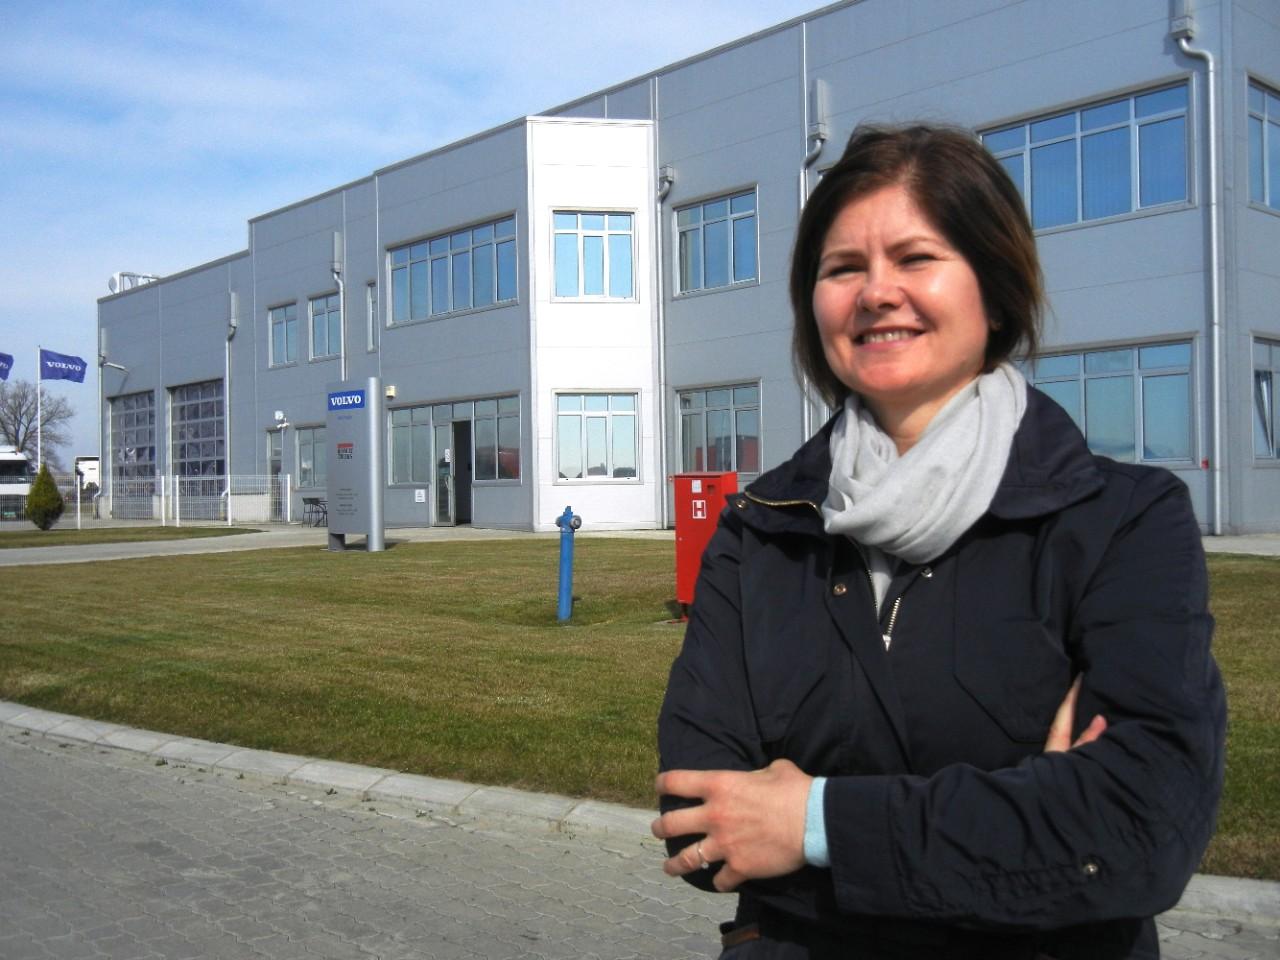 Snježana Suručić, Human Resources Director at Volvo Trucks Adriatic South.